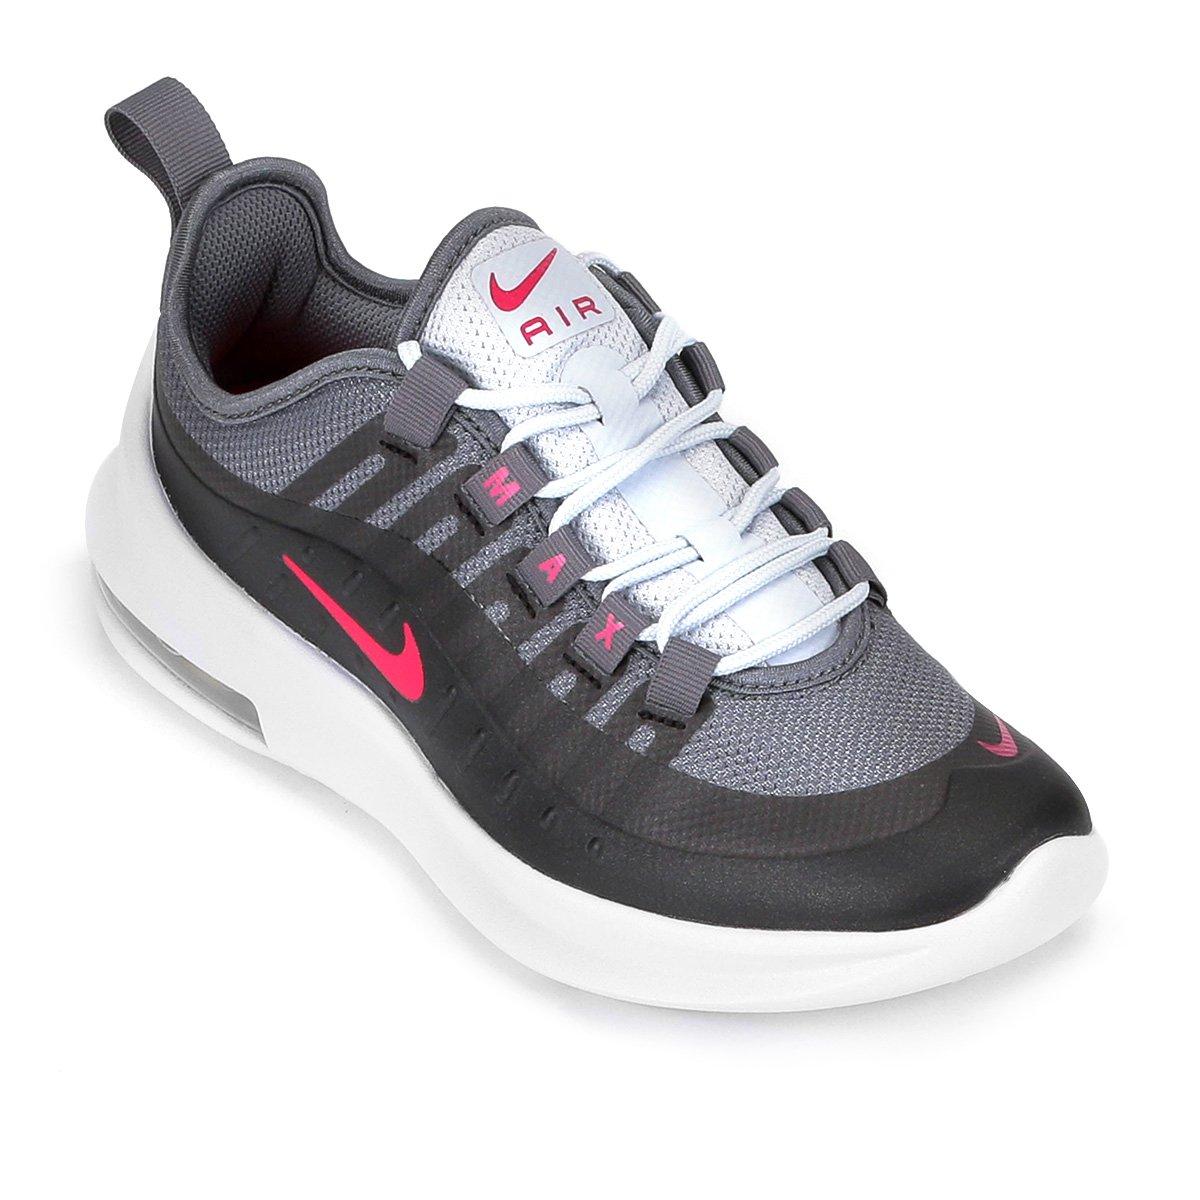 55071b8422c Tênis Infantil Nike Infantil Air Max Axis - Compre Agora